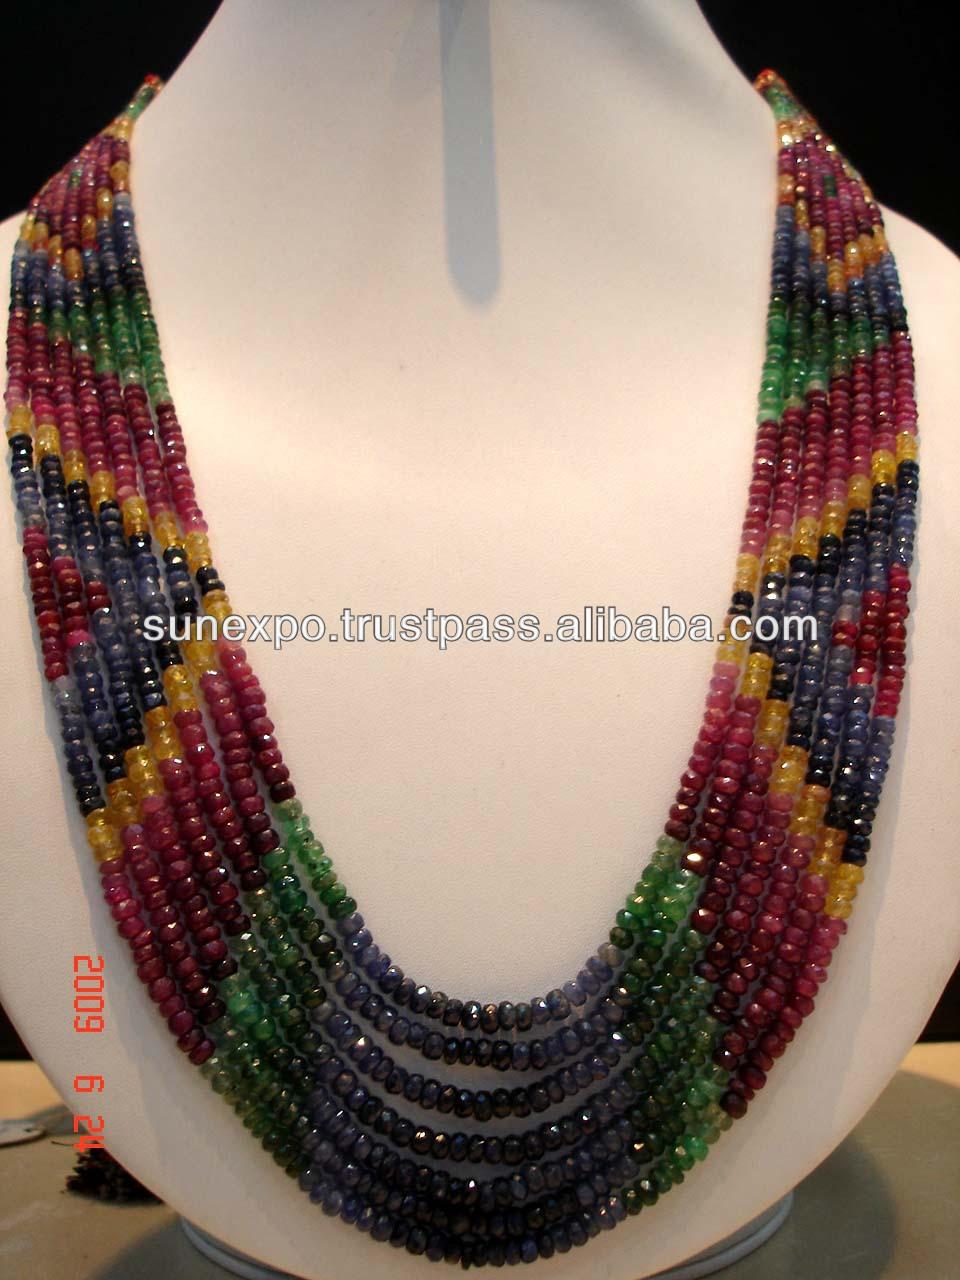 7 Strands Ruby Sapphire Emerald Multi Gemstone Necklace